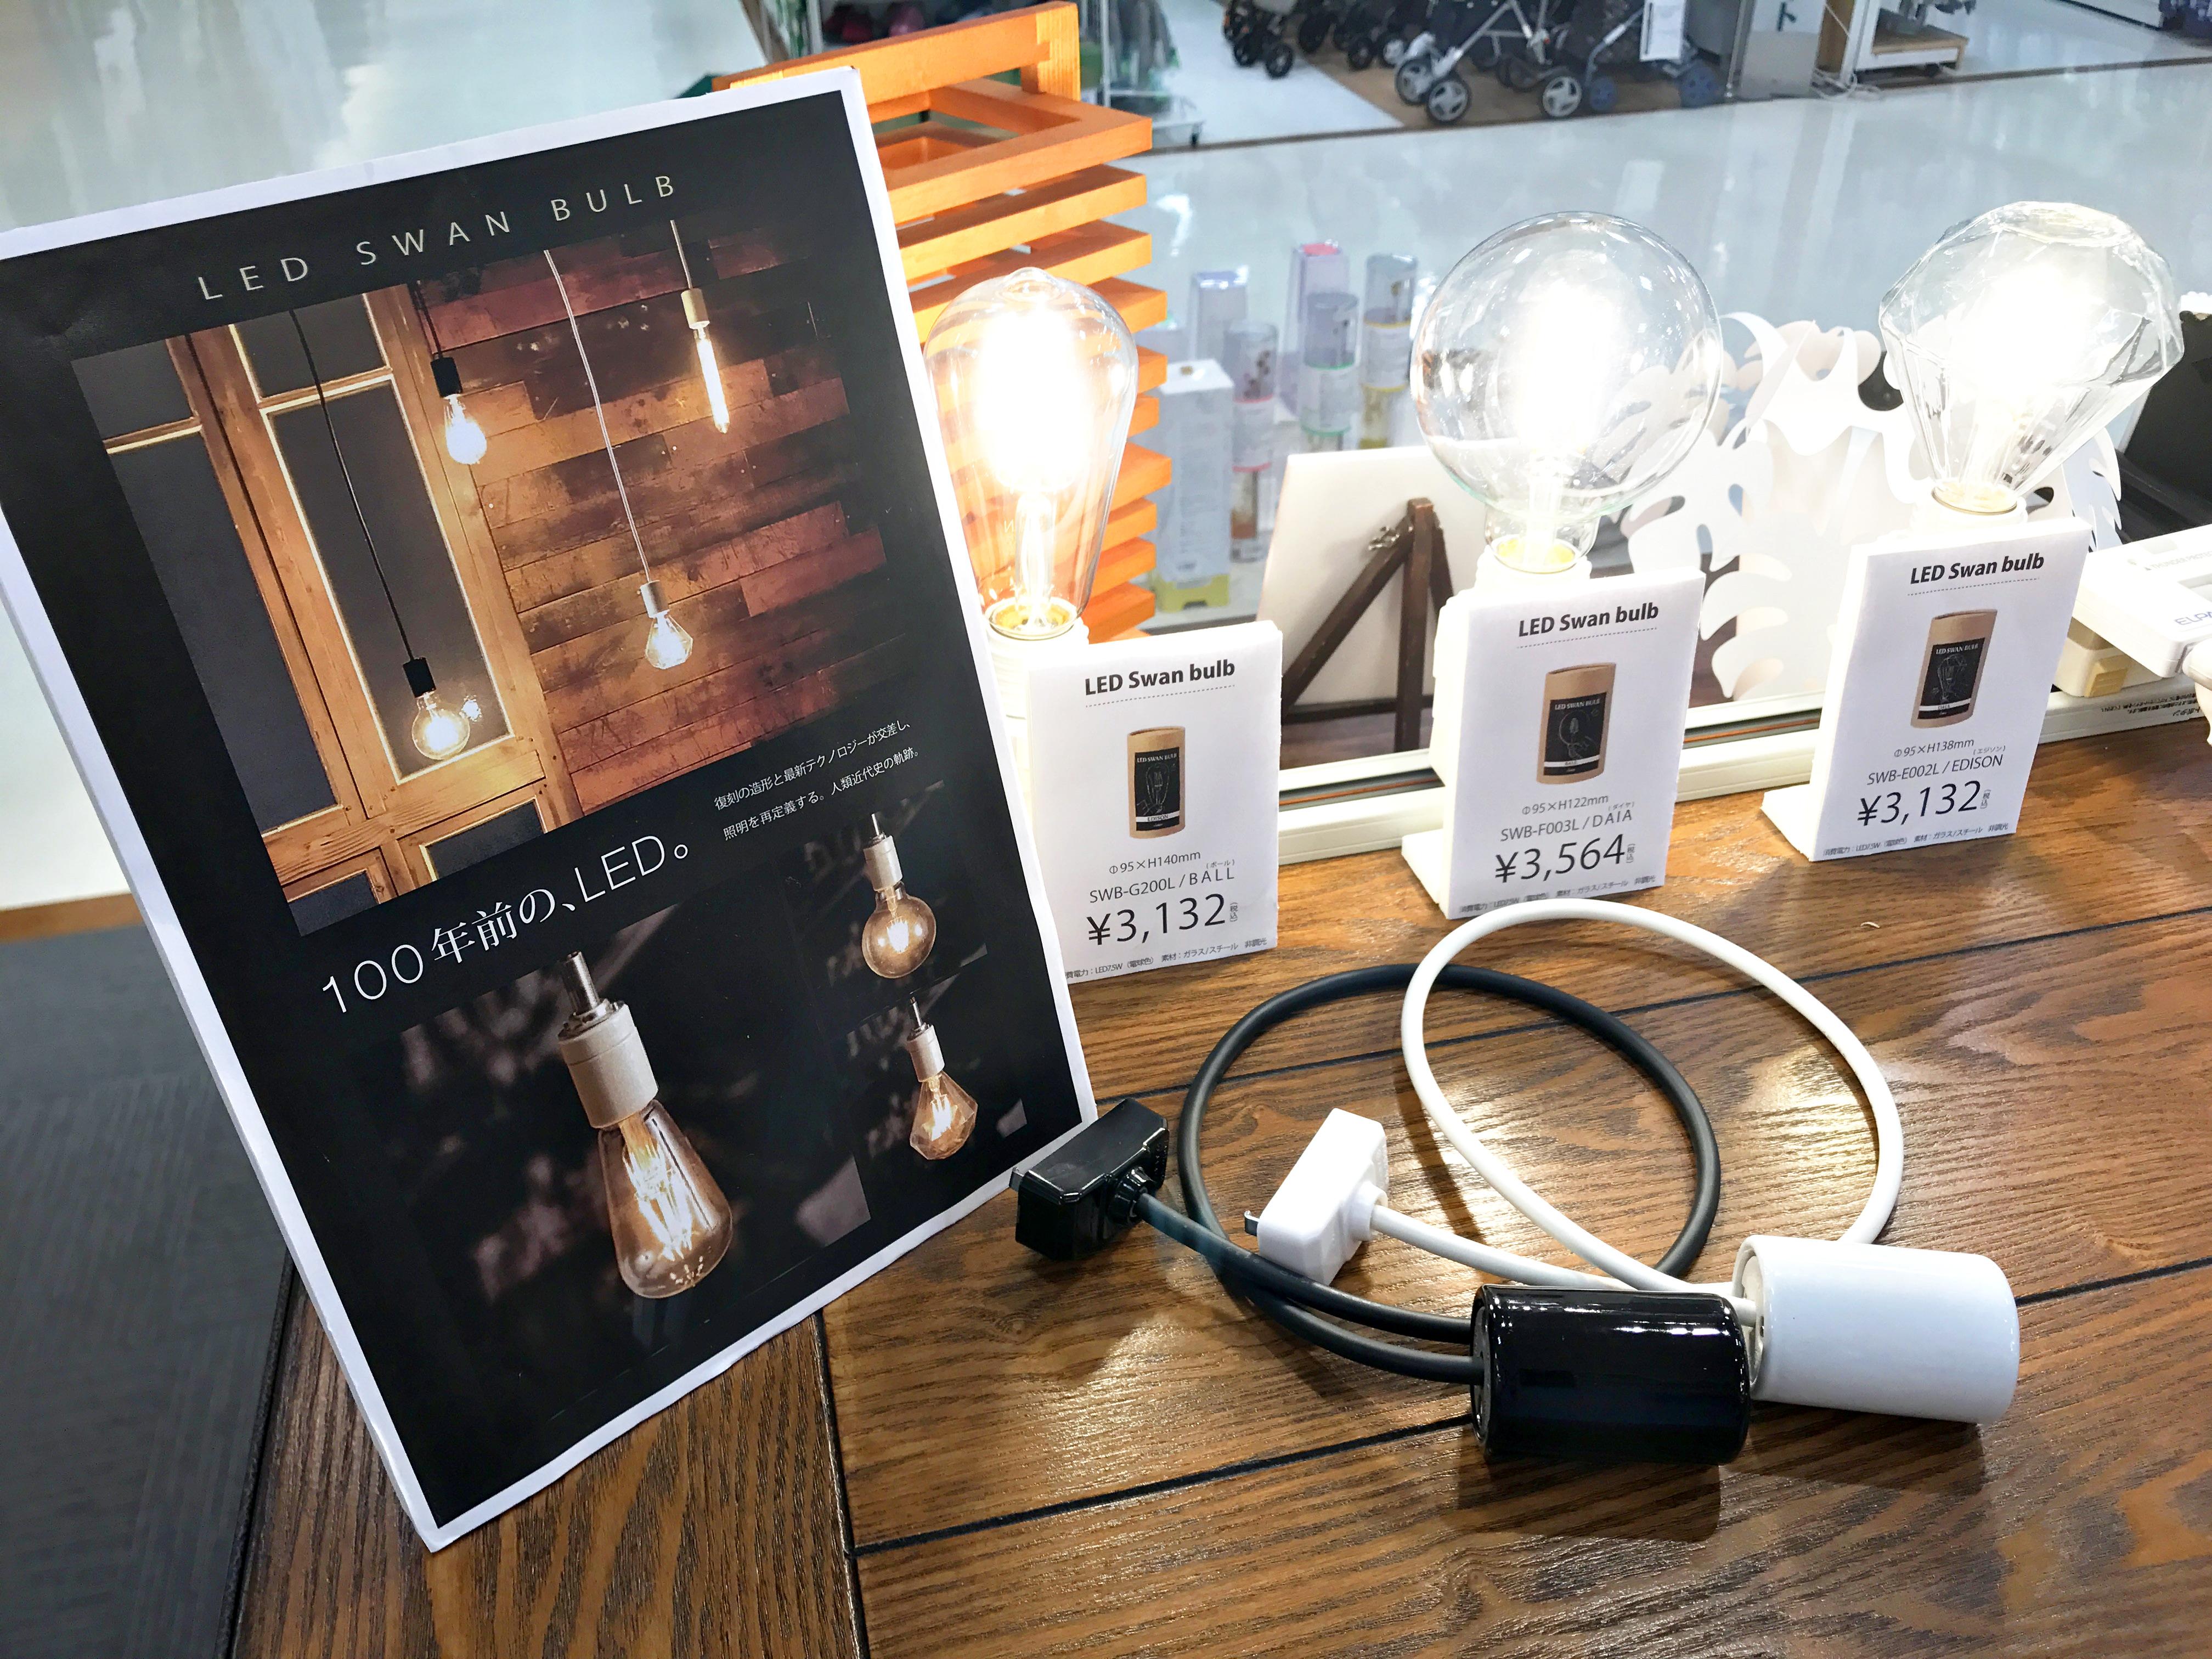 【LED Swan bulb 】新商品入荷しました!~アリオ亀有店~